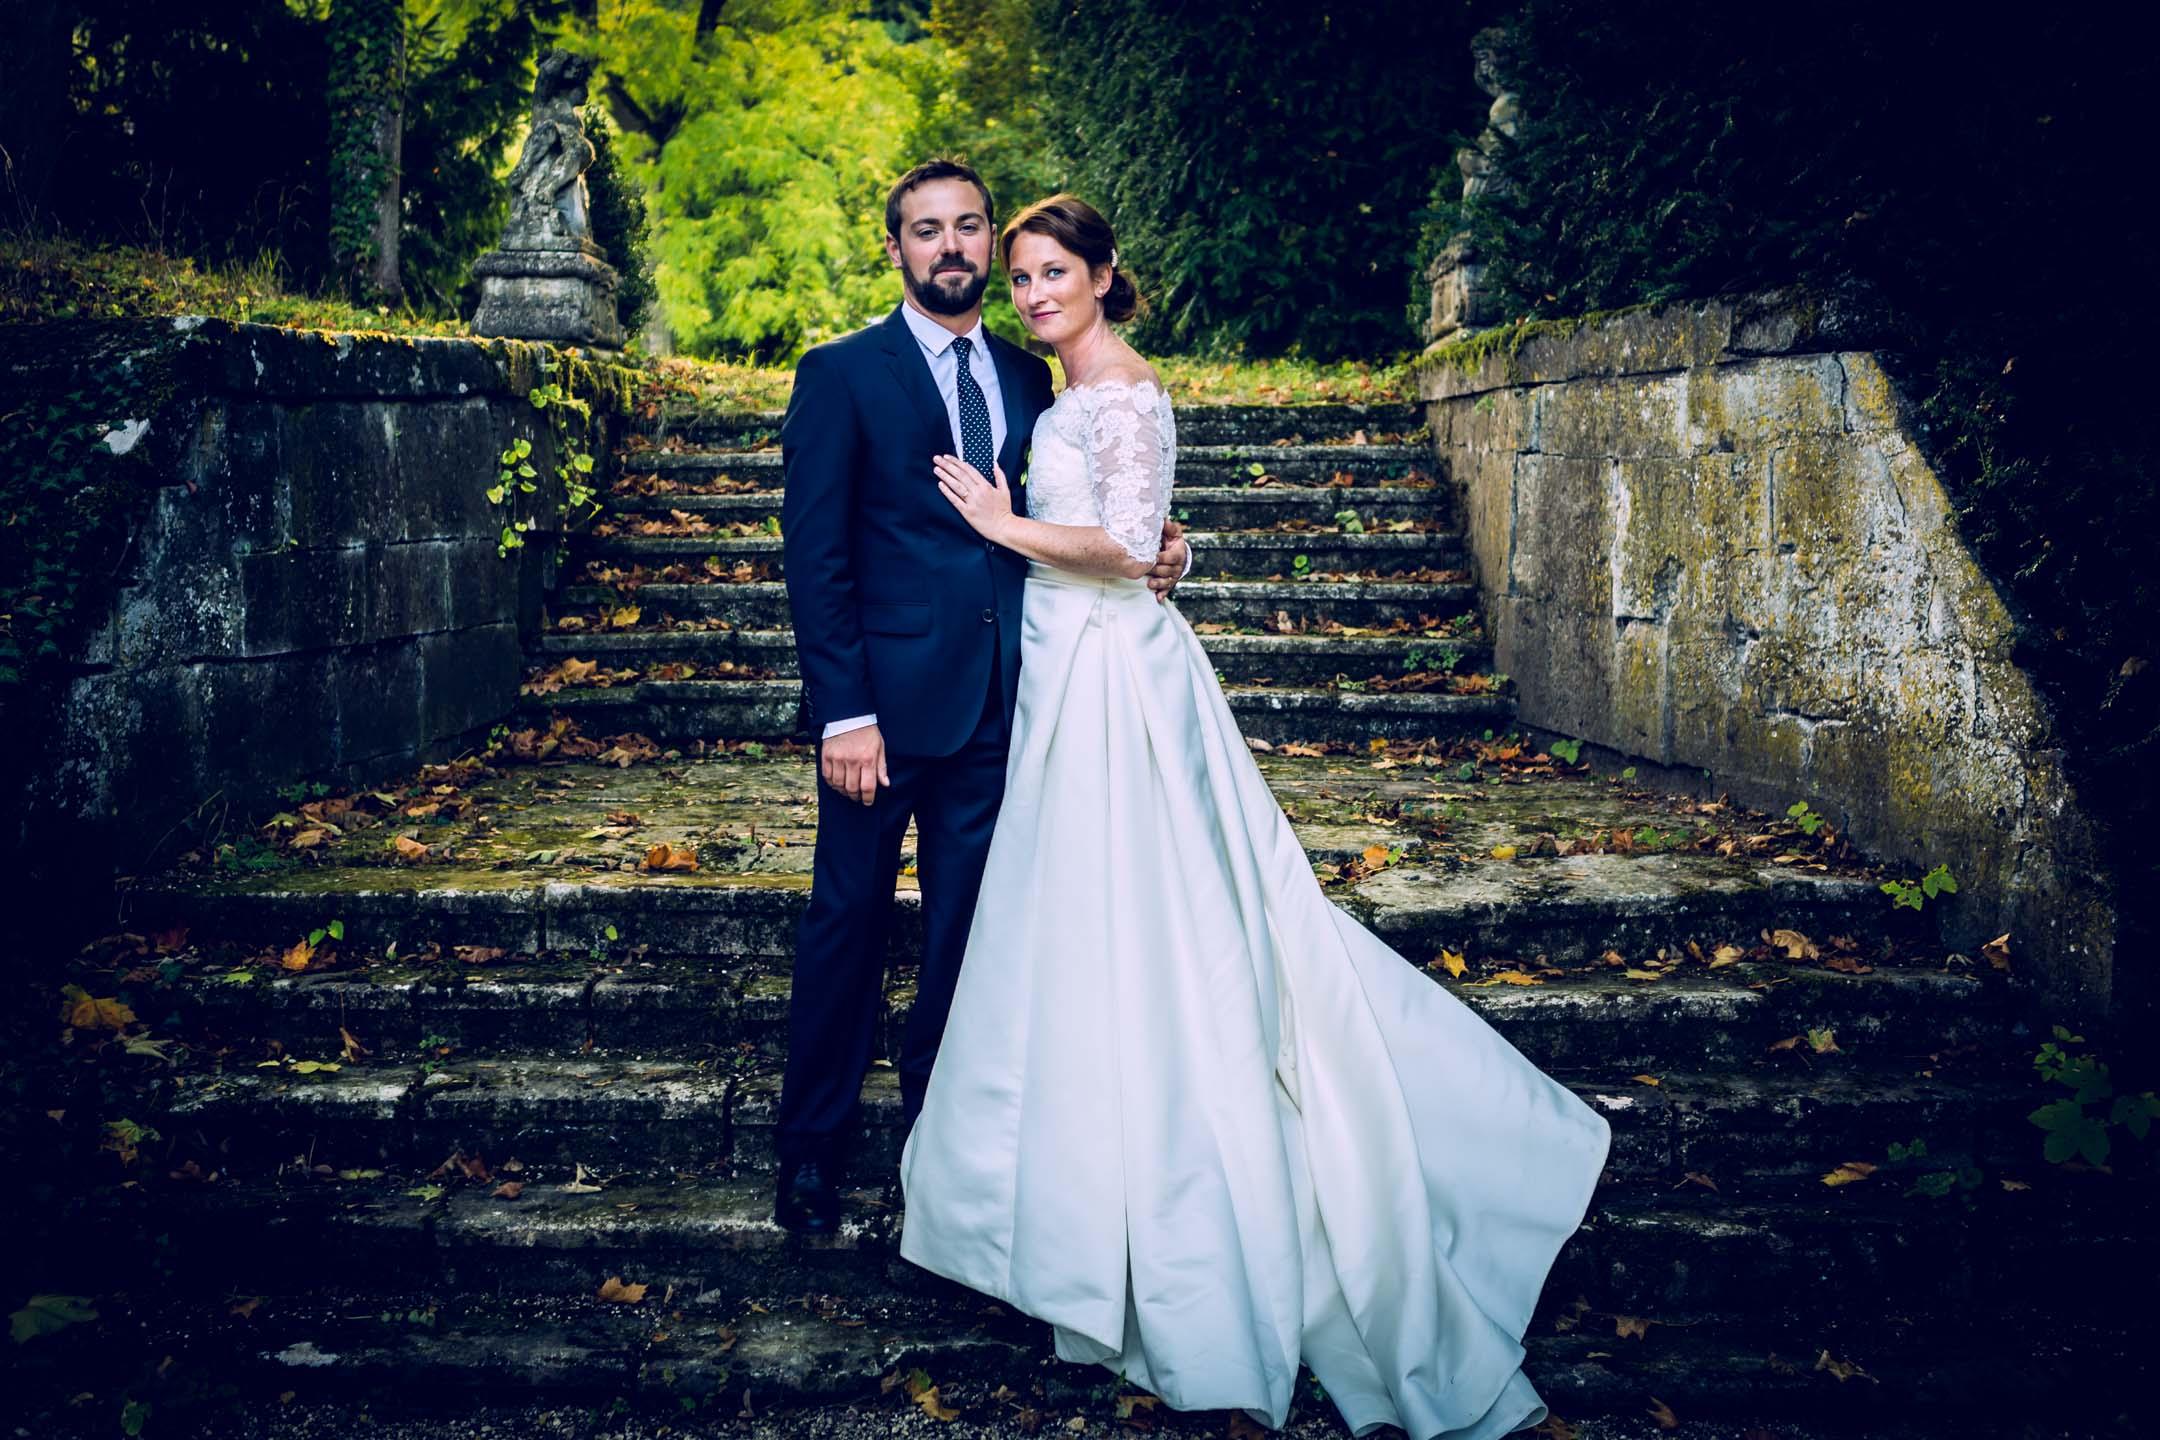 Portrait couple photographe mariage nicolas giroux - Photo de mariage couple ...